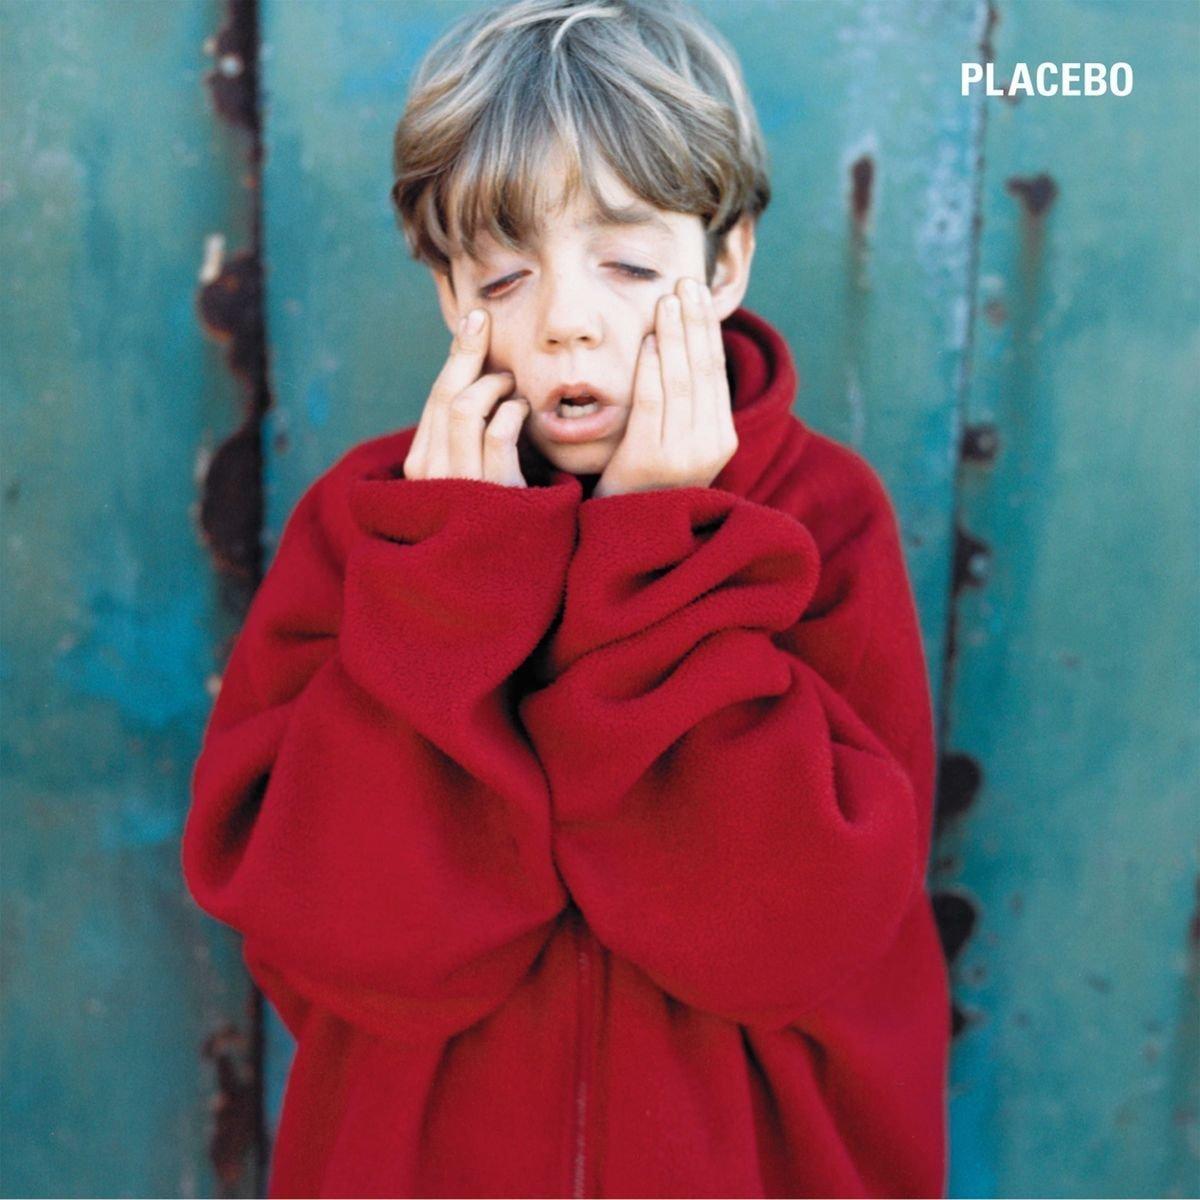 Placebo Album vinyle 1996